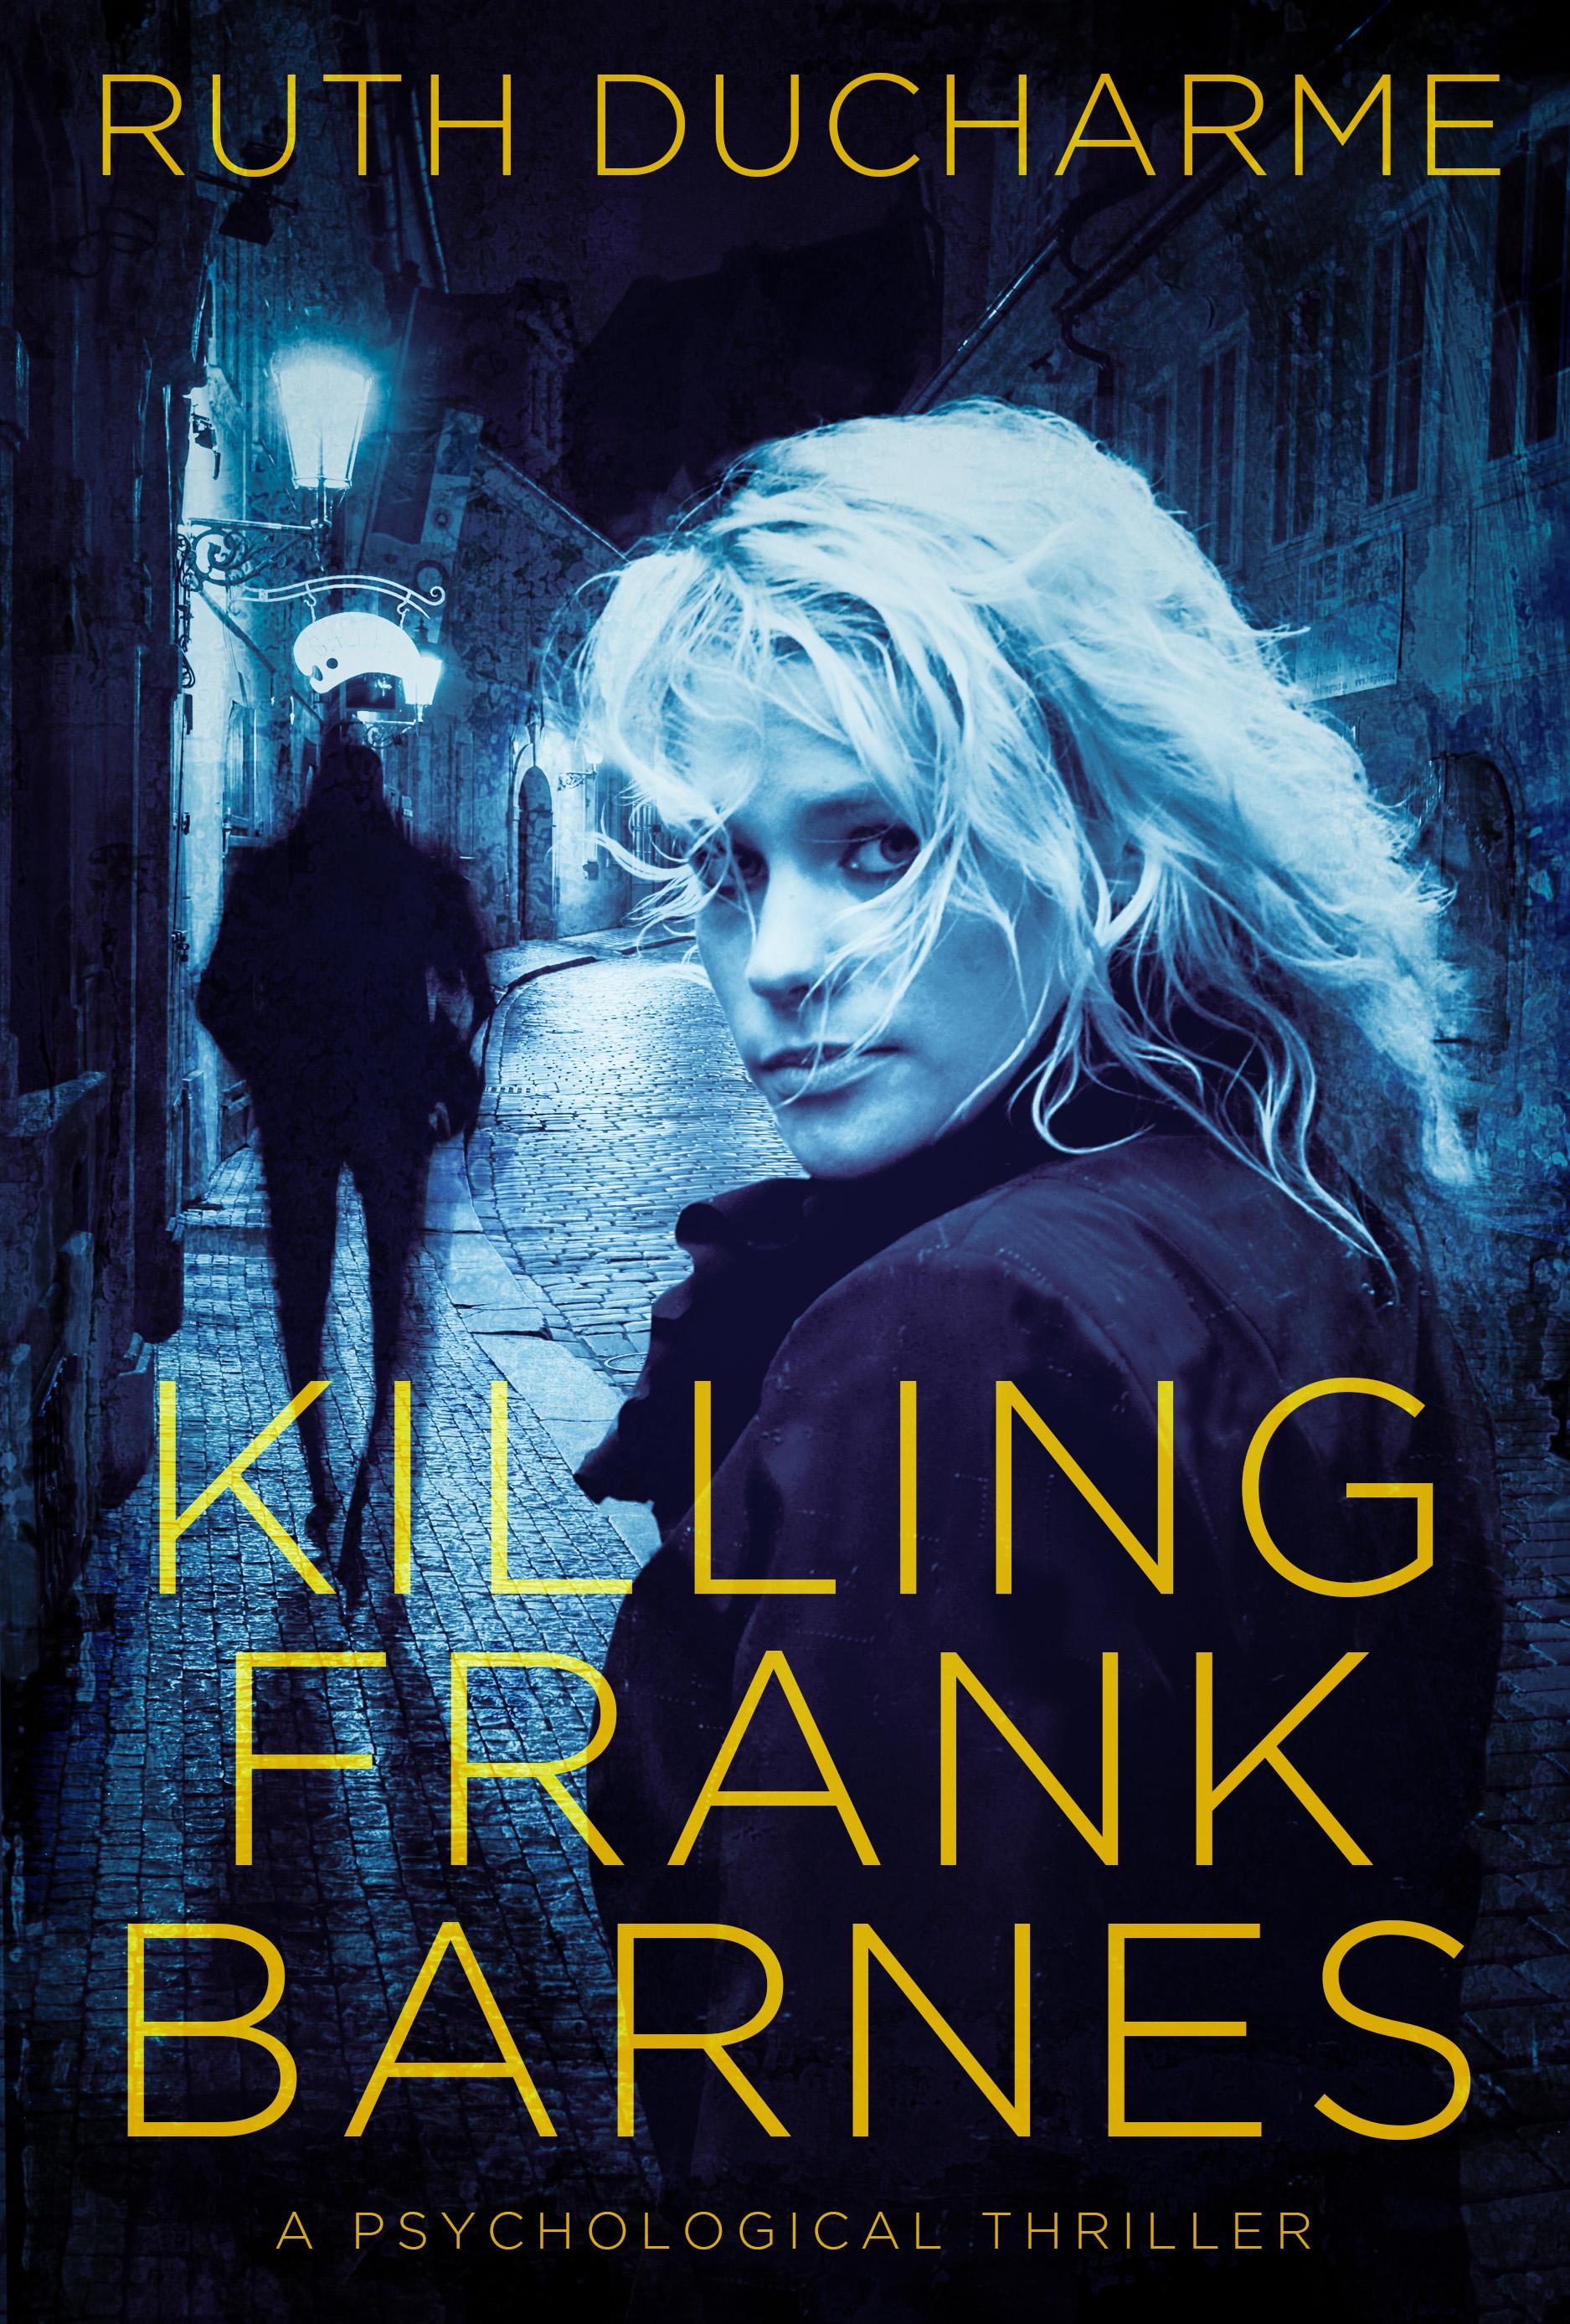 KillingFrankBarnes